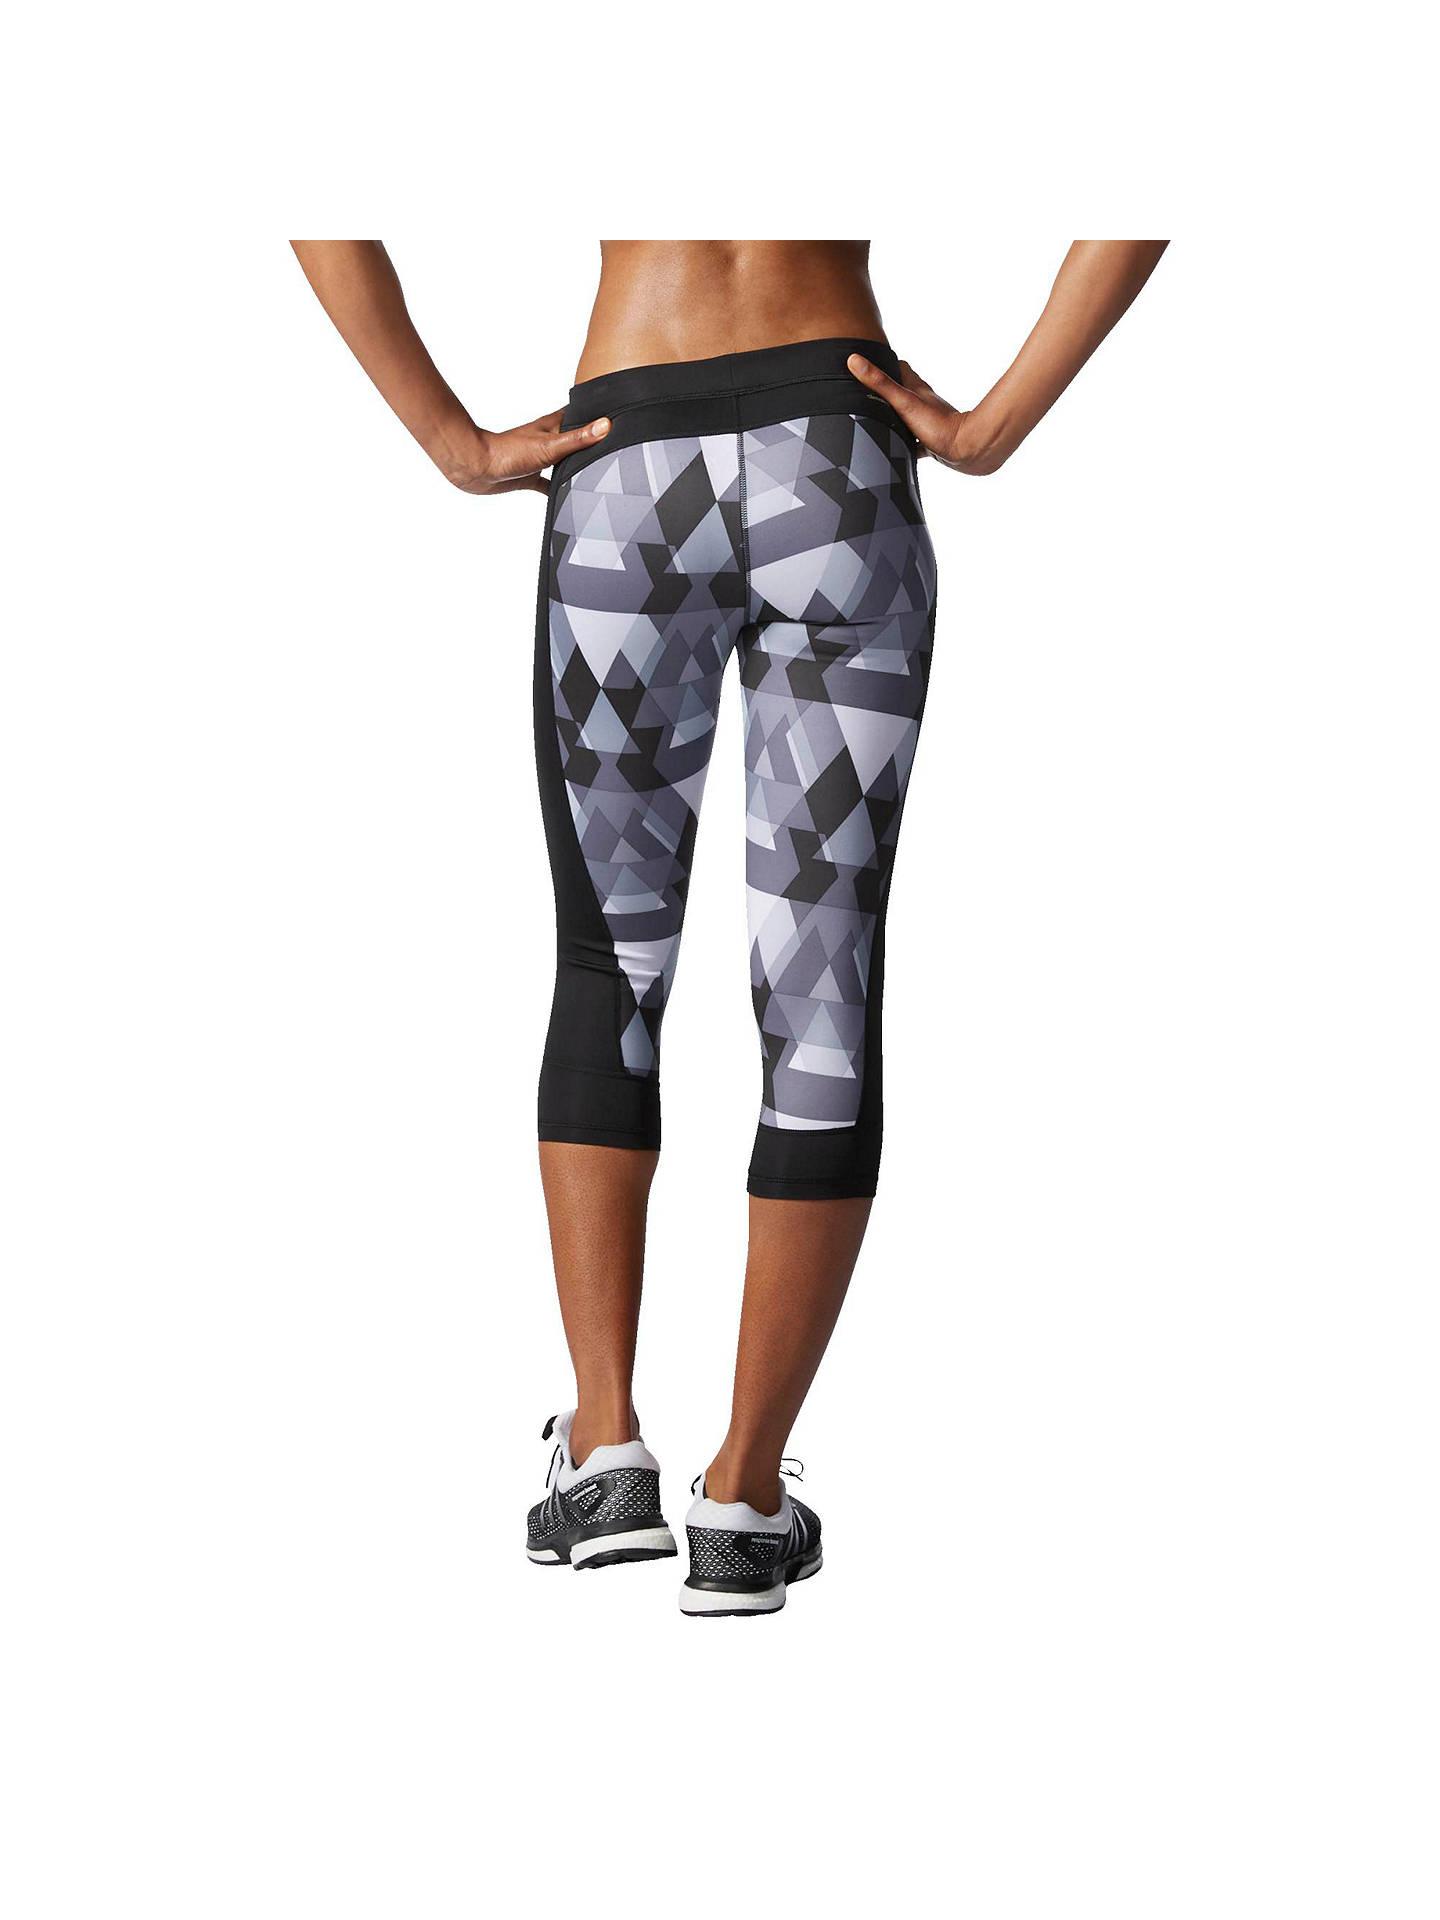 304c56c67ed1e ... Buy Adidas Techfit Triax-Print Training Capris, Black/Grey, XS Online  at ...